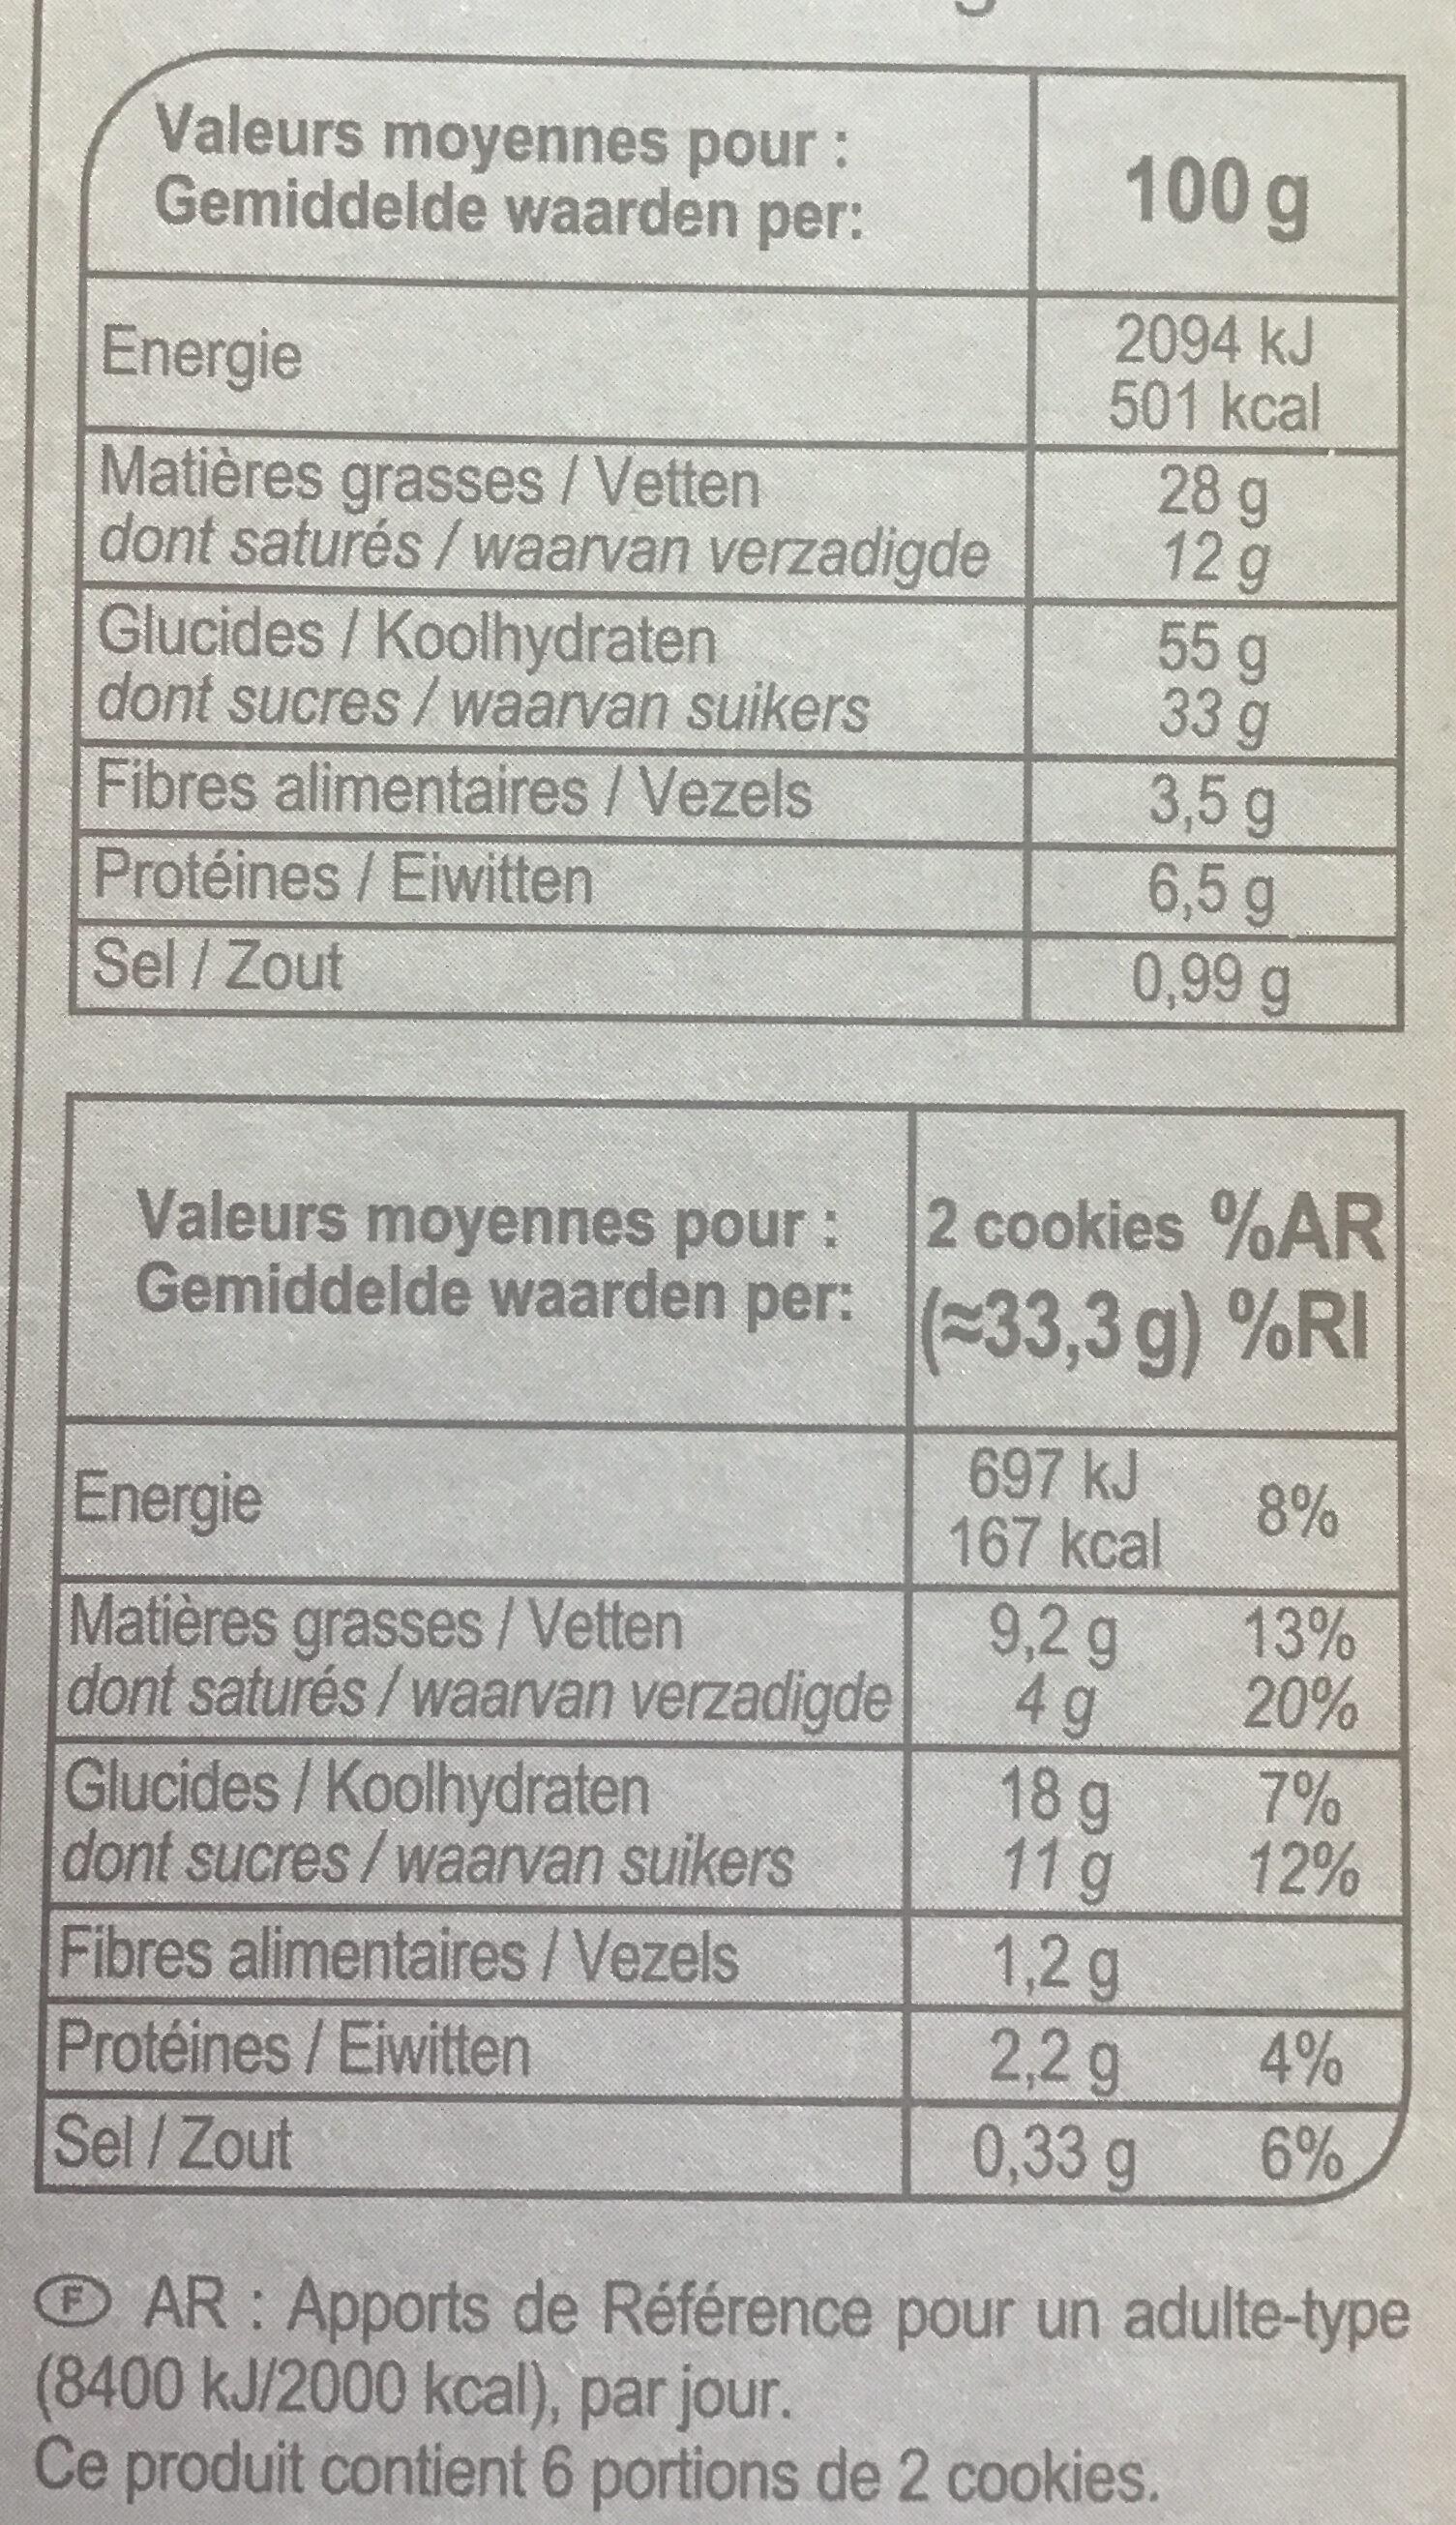 Cookies Choco Noisettes - Información nutricional - fr